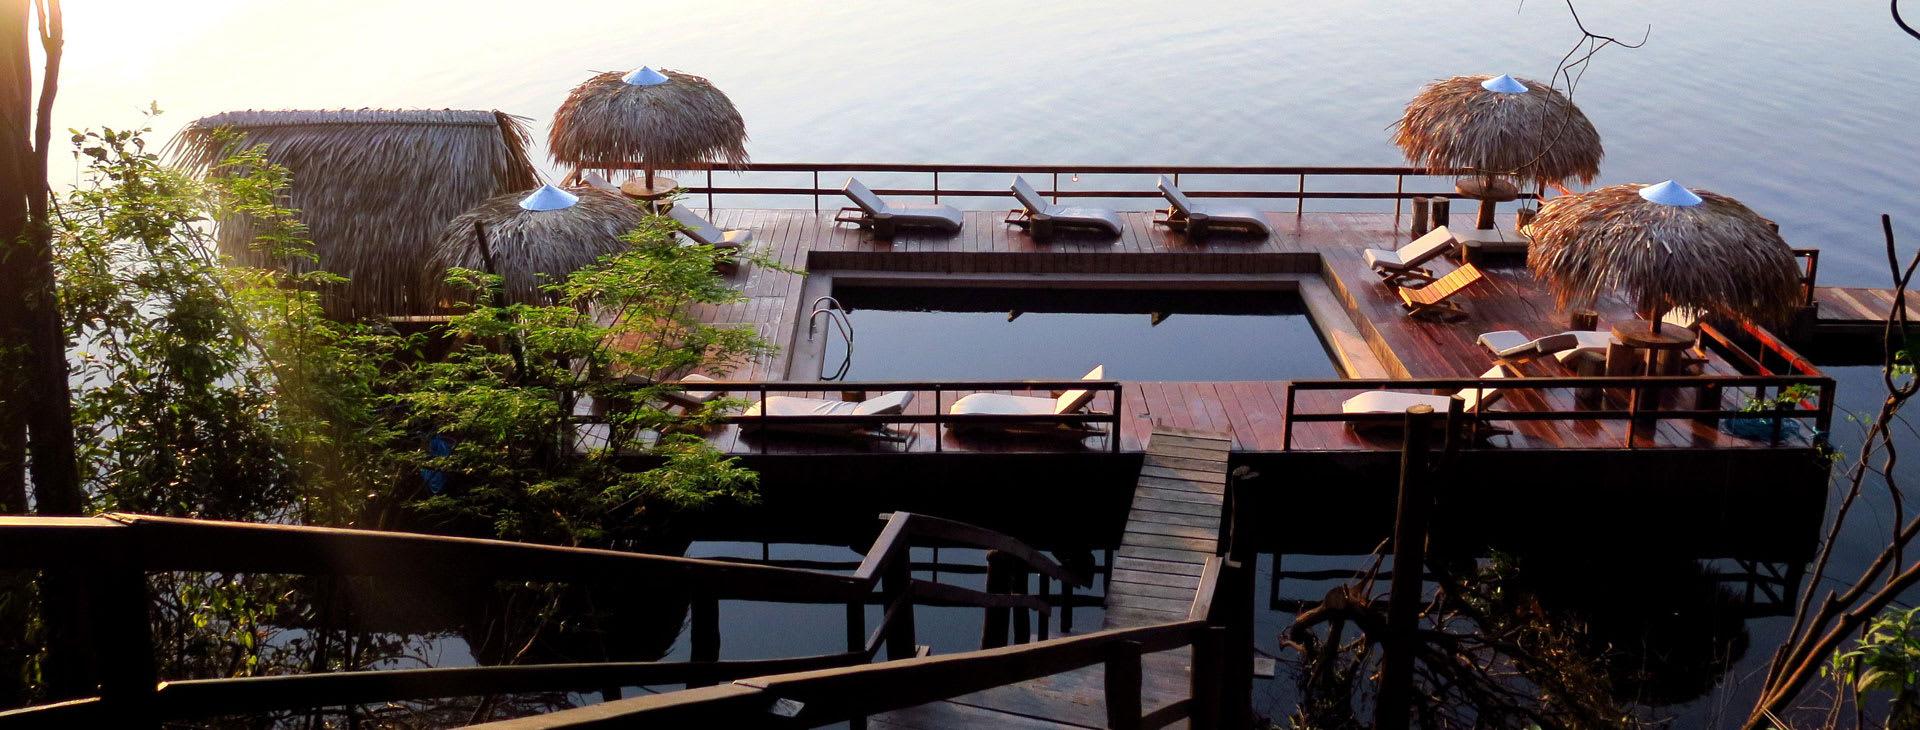 Juma Lodge terrace on stilts